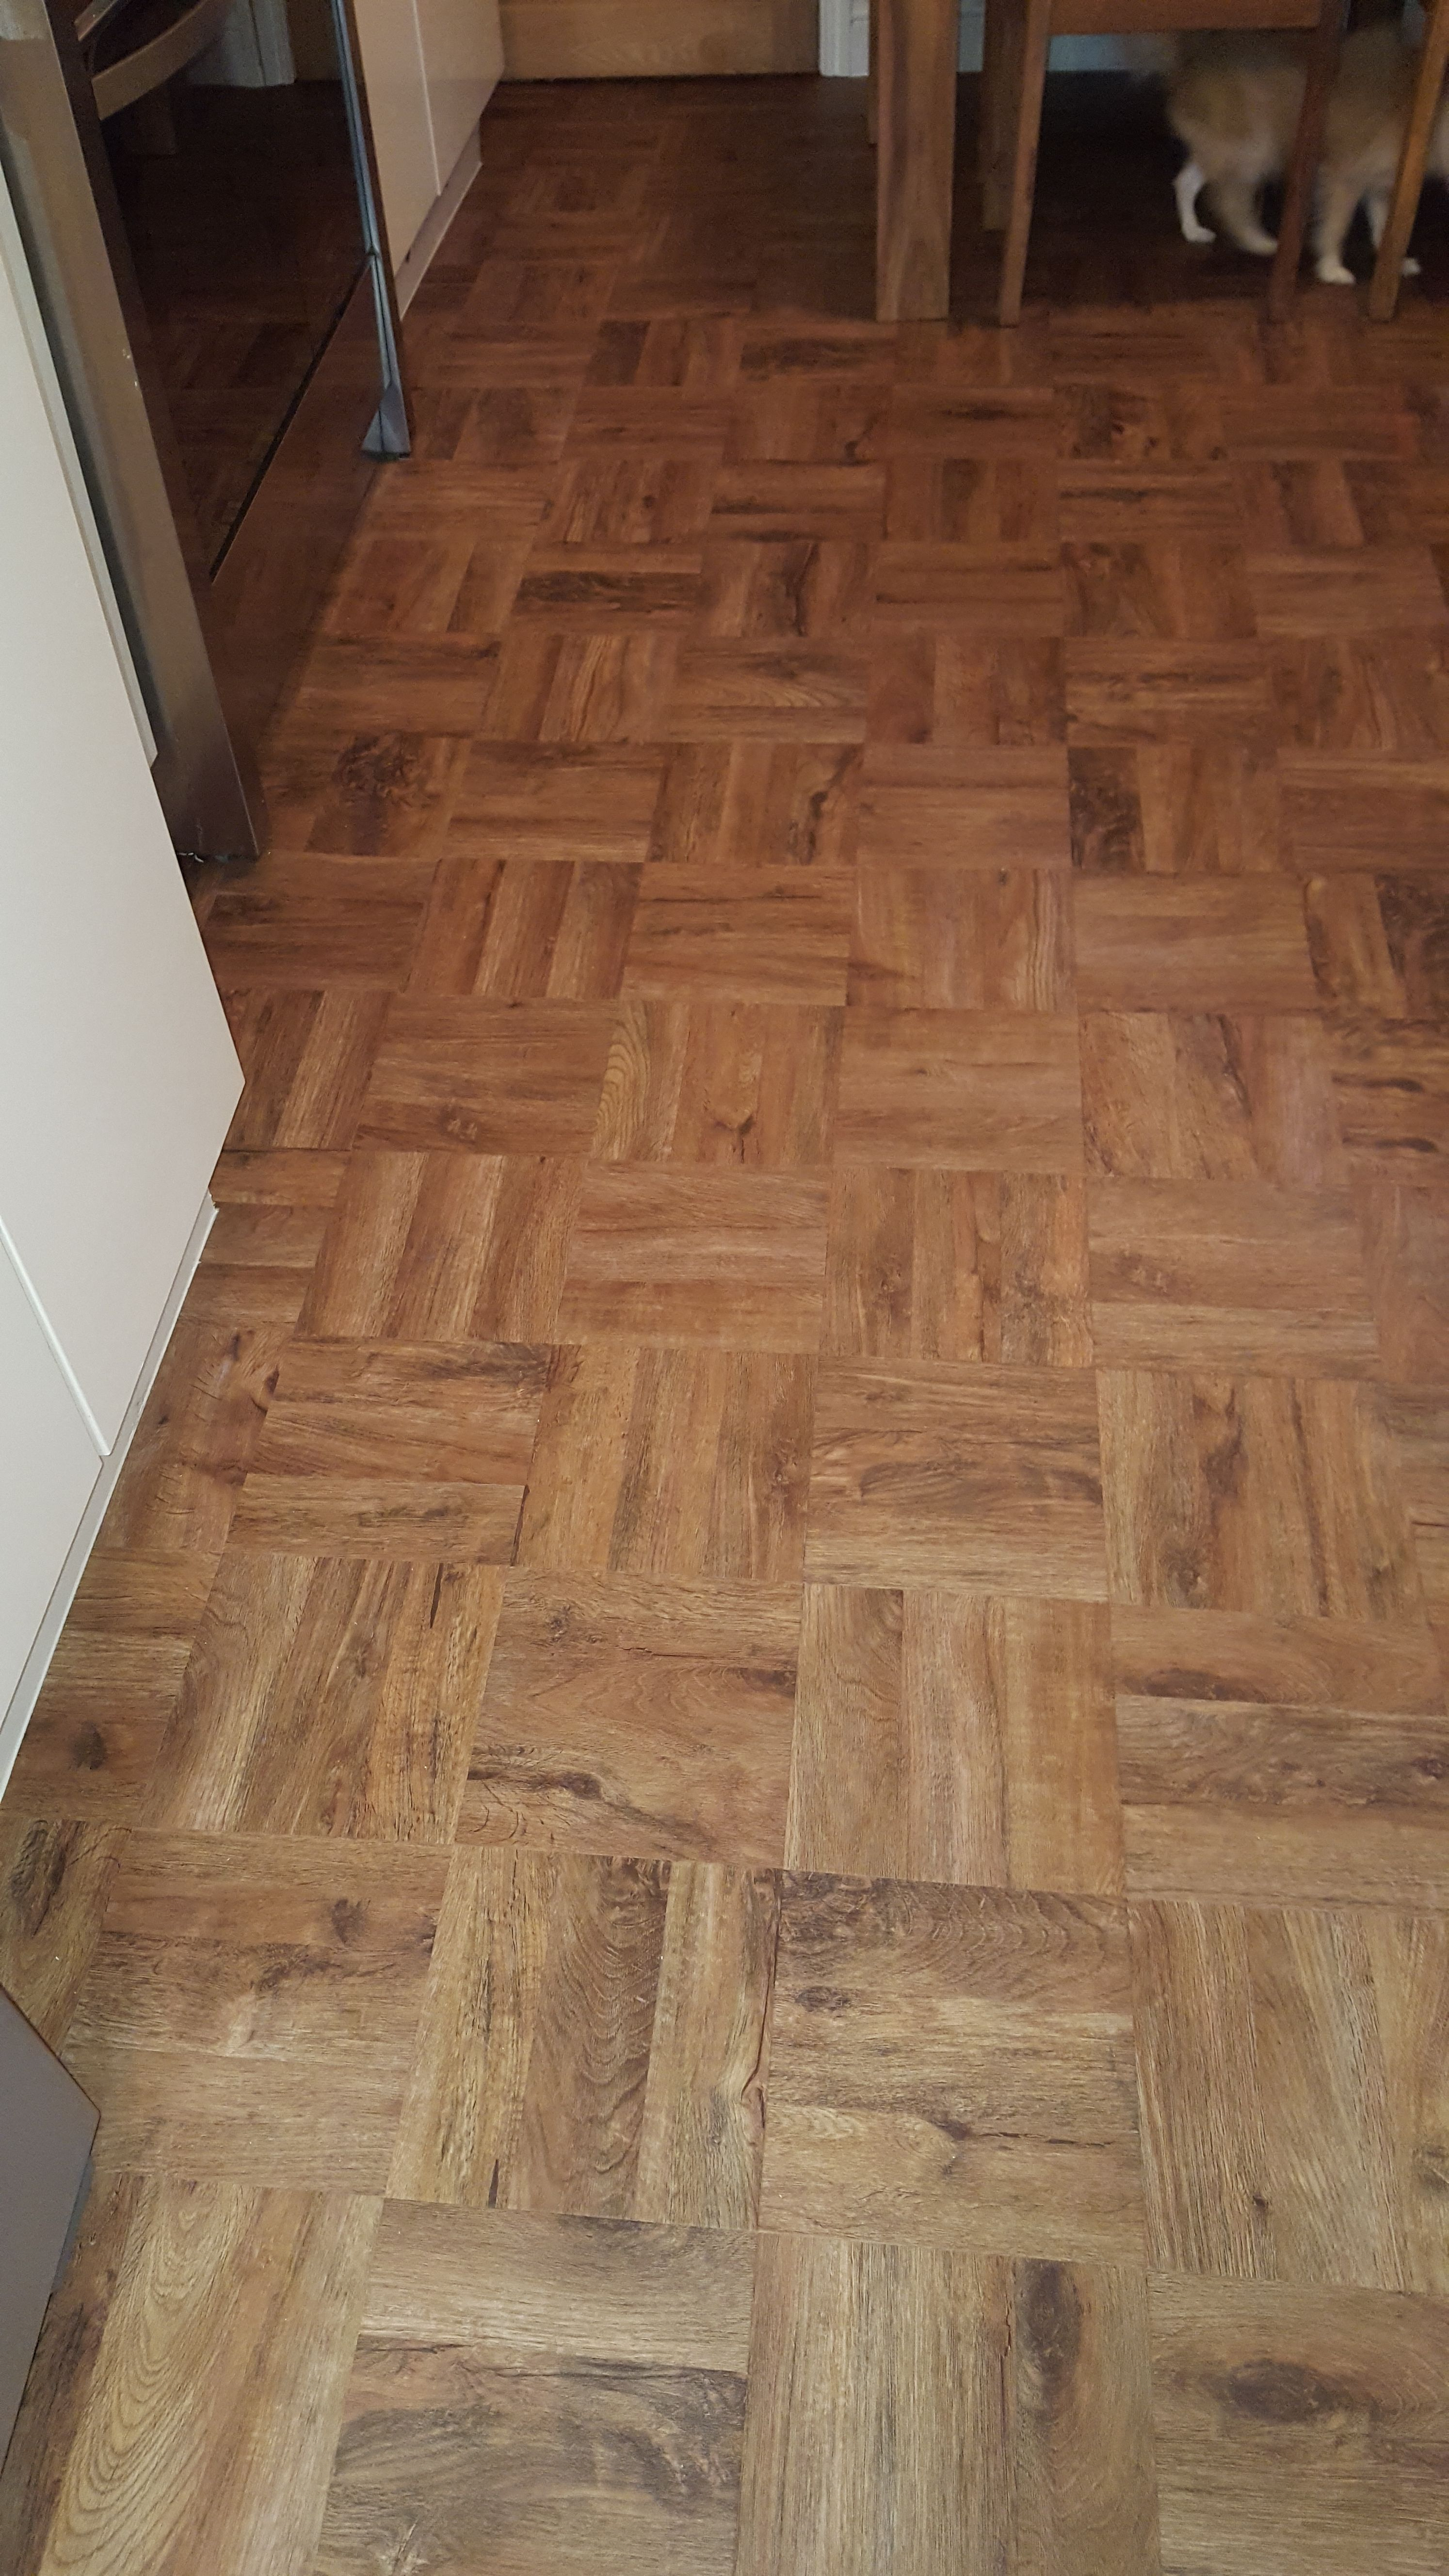 Parquet Luxury Vinyl Tiles Polyflor Camaro Flooring Vinyl Flooring Luxury Vinyl Tile Flooring